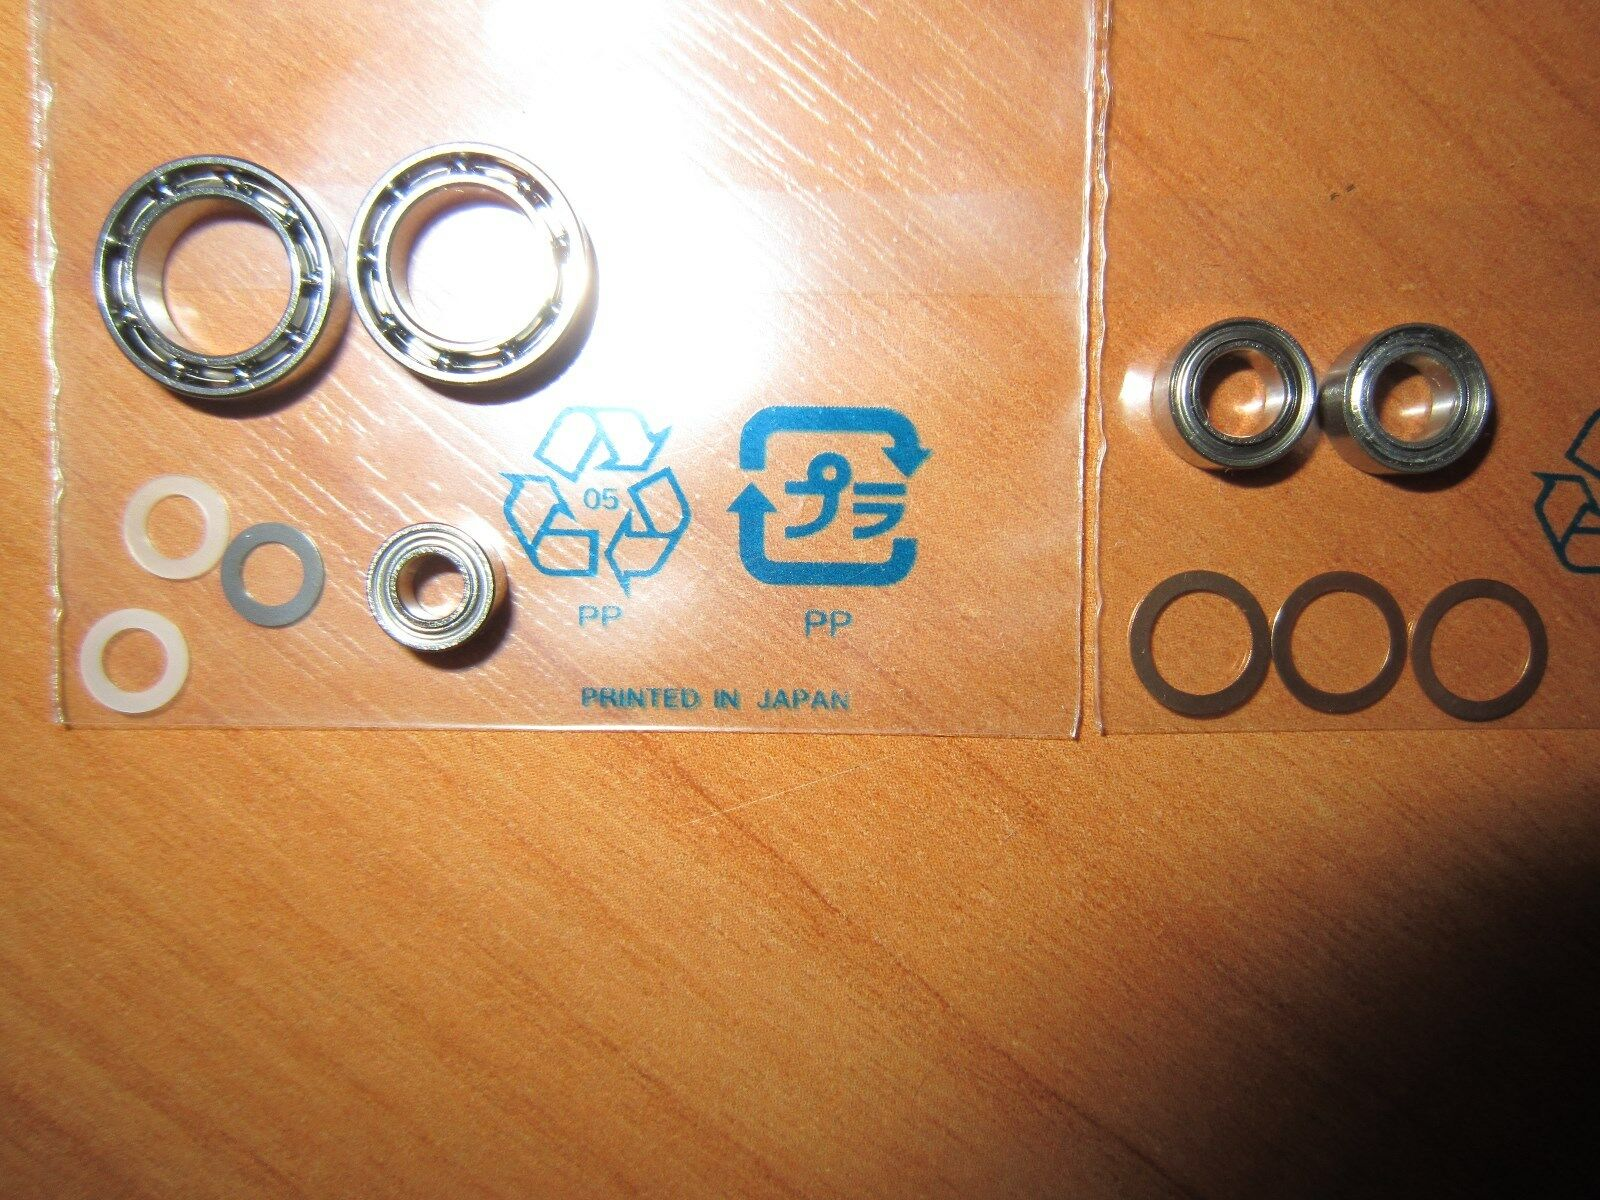 Daiwa Freams Daiwa 15 Freams 2004 - 3000 Full Bearing Kit Line Roller Knob Drag